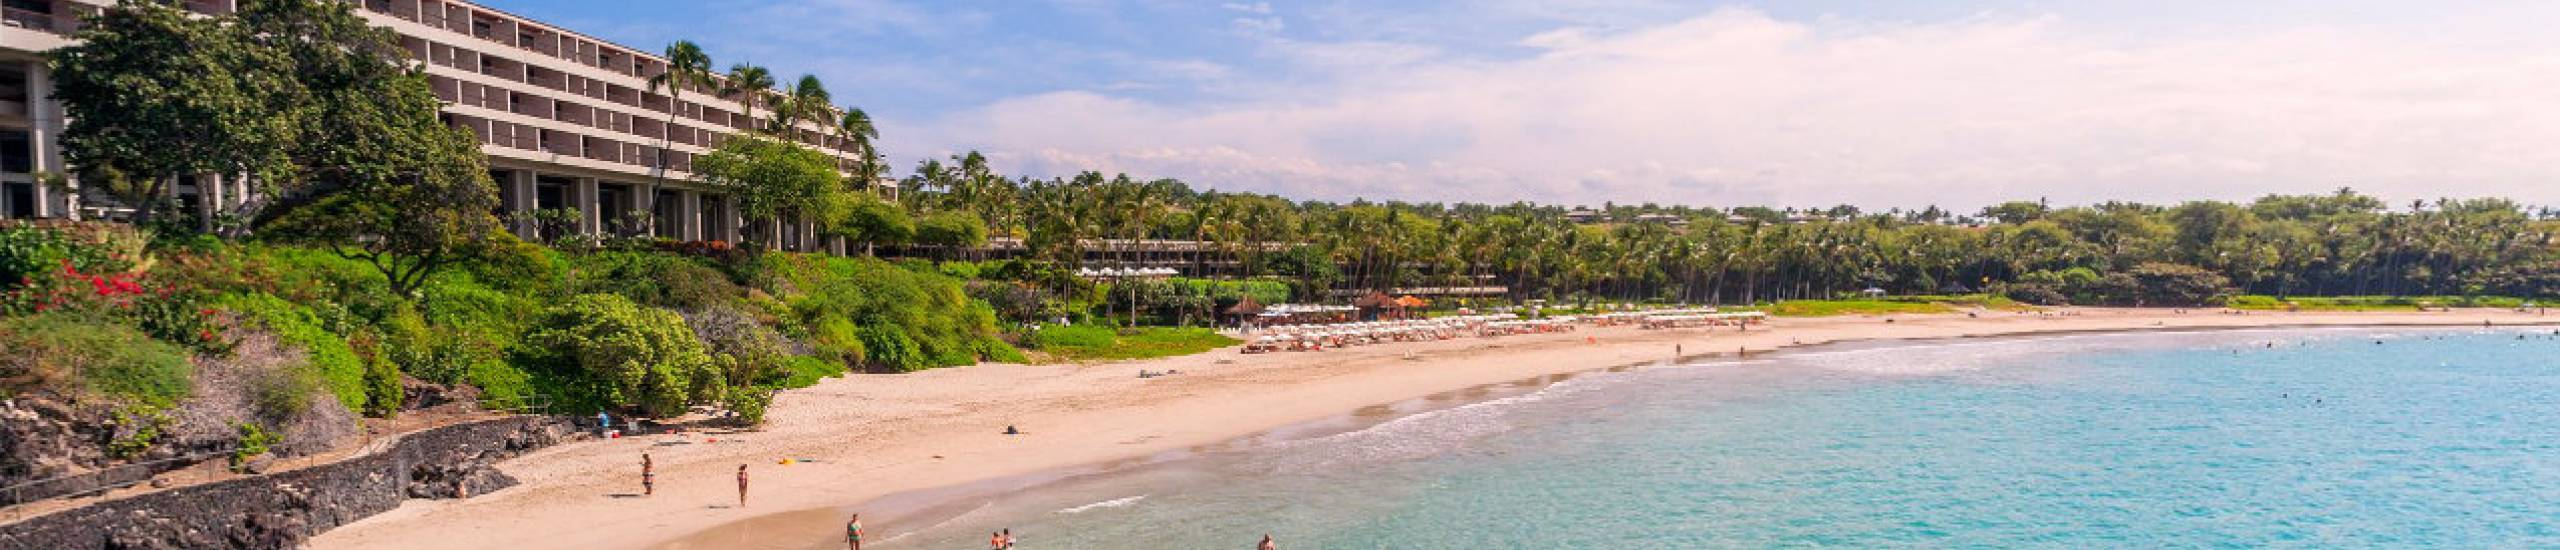 Mauna Kea Beach for Kumulani Guests